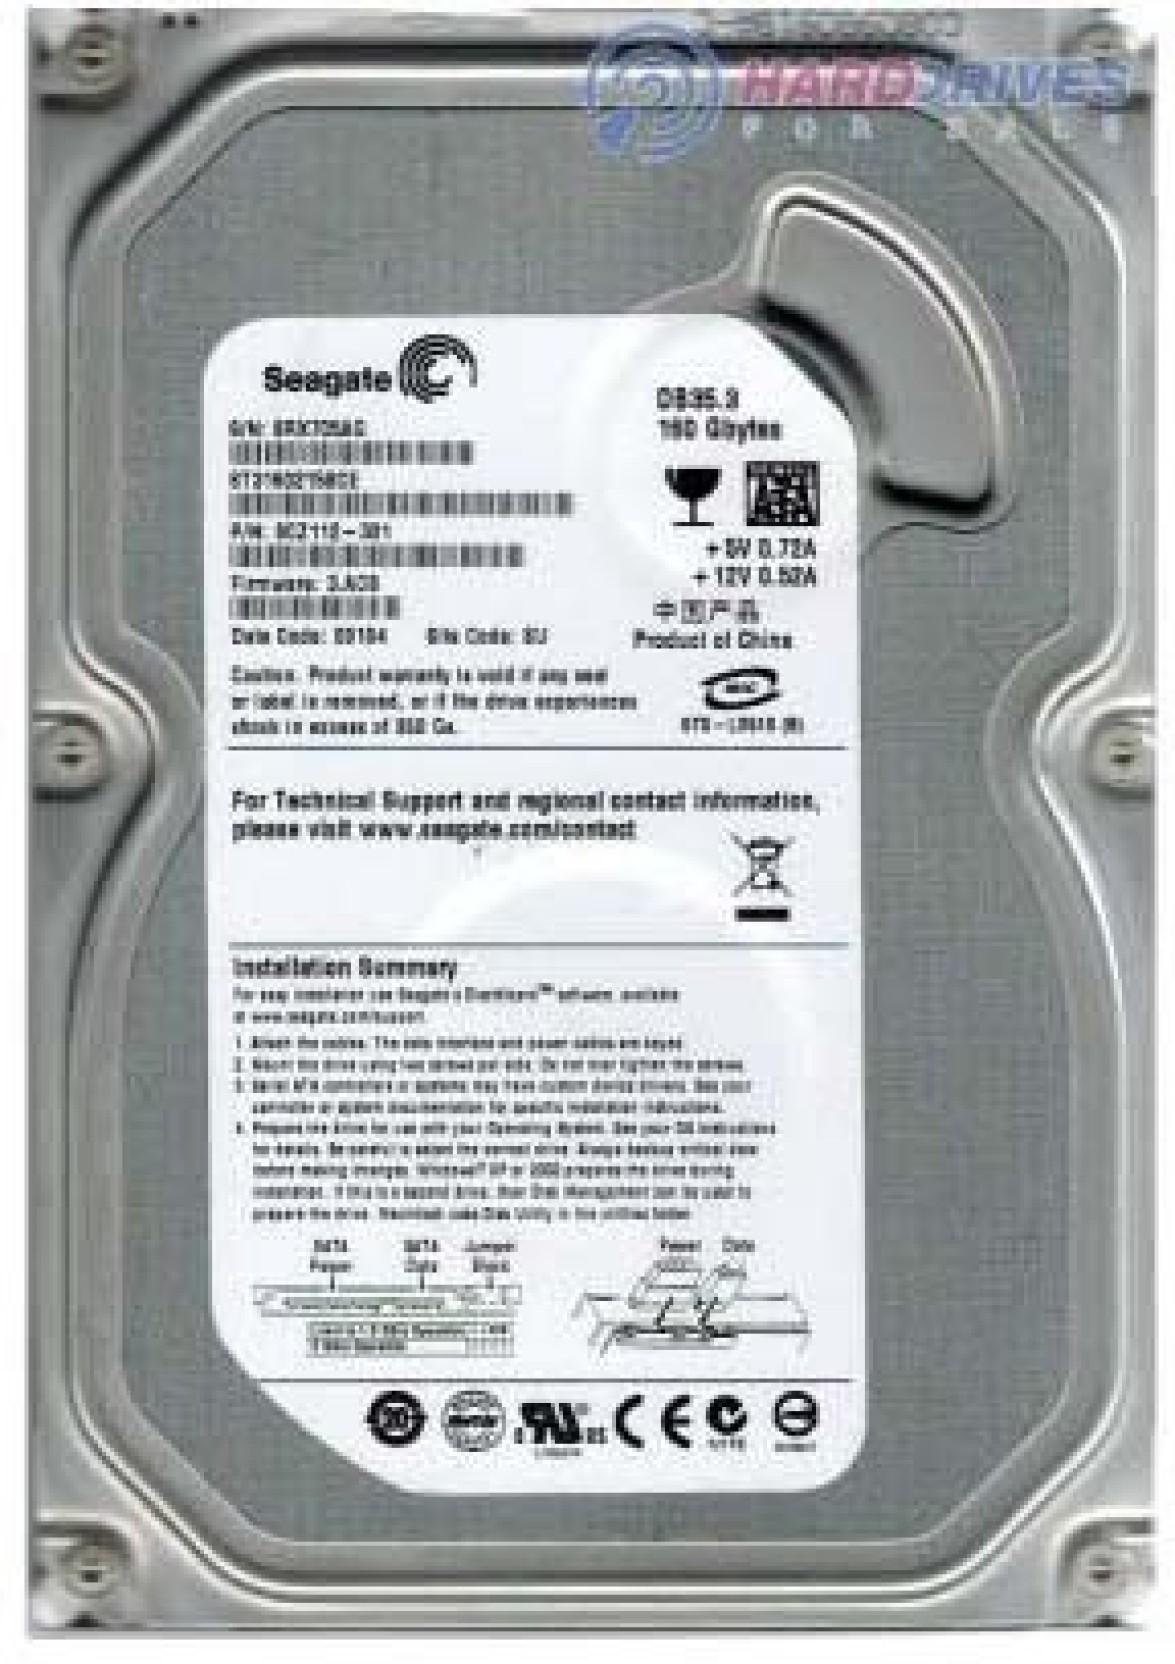 Seagate DB 35.3 160 GB Desktop Internal Hard Disk Drive (IDE Desktop). ADD TO CART